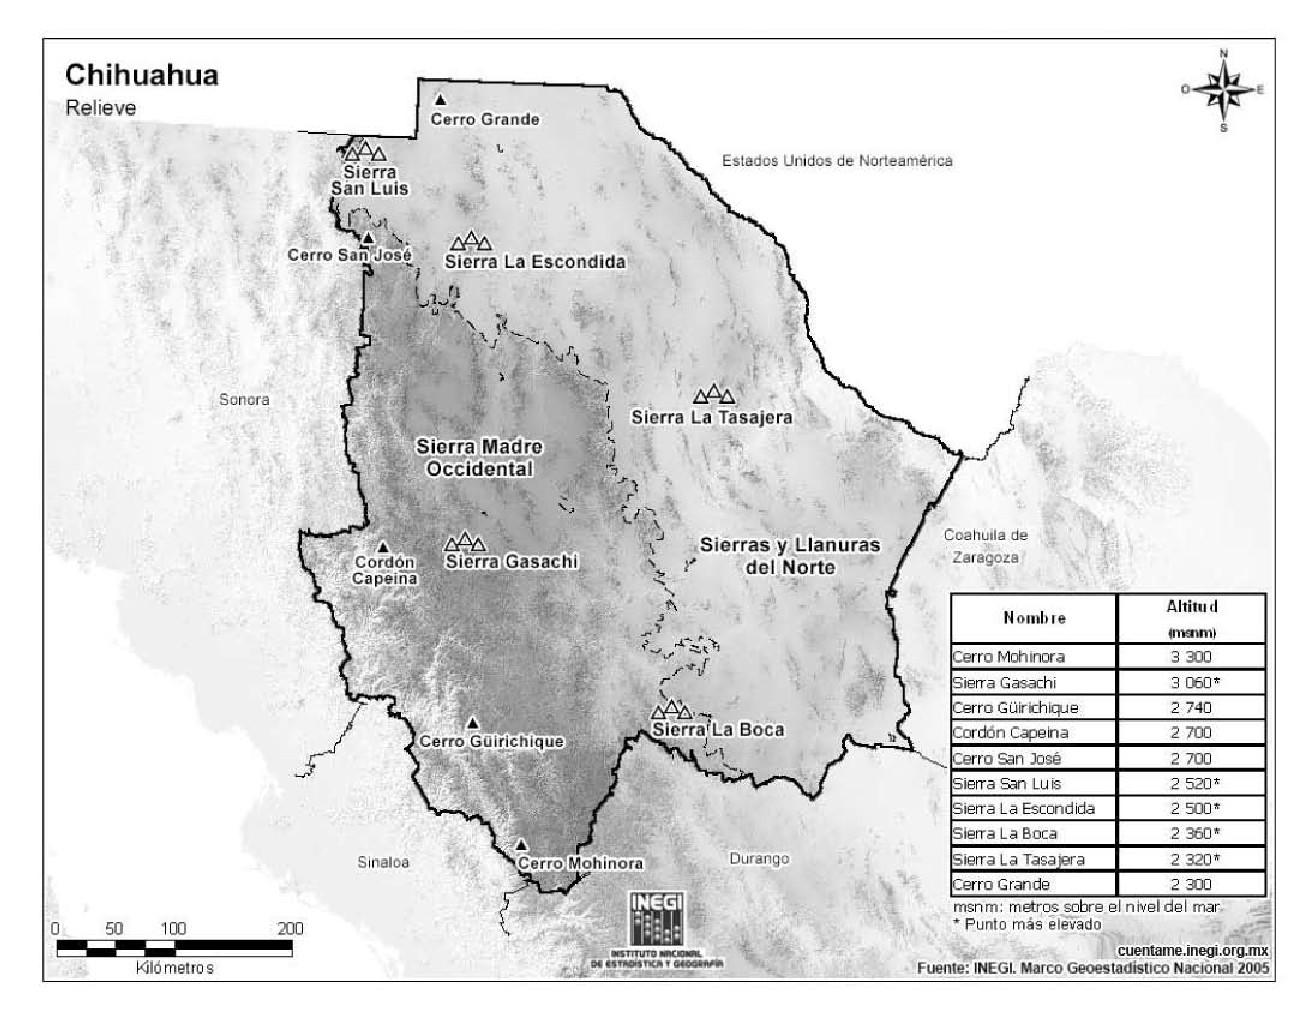 Mapa de montañas de Chihuahua. INEGI de México